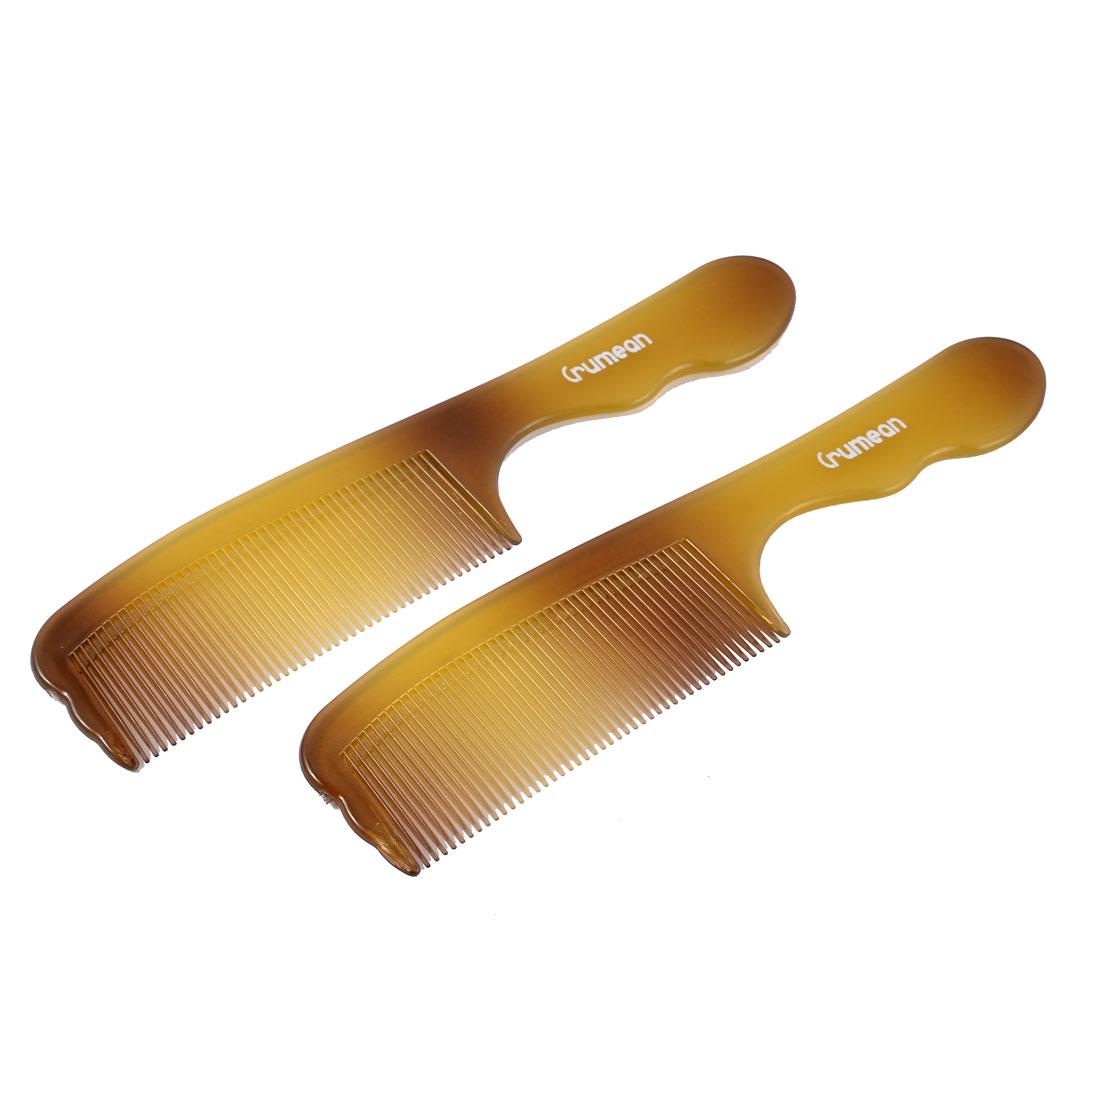 Home Plastic Hairdressing Wavy Handgrip Anti-static Hair Comb Brown 2pcs